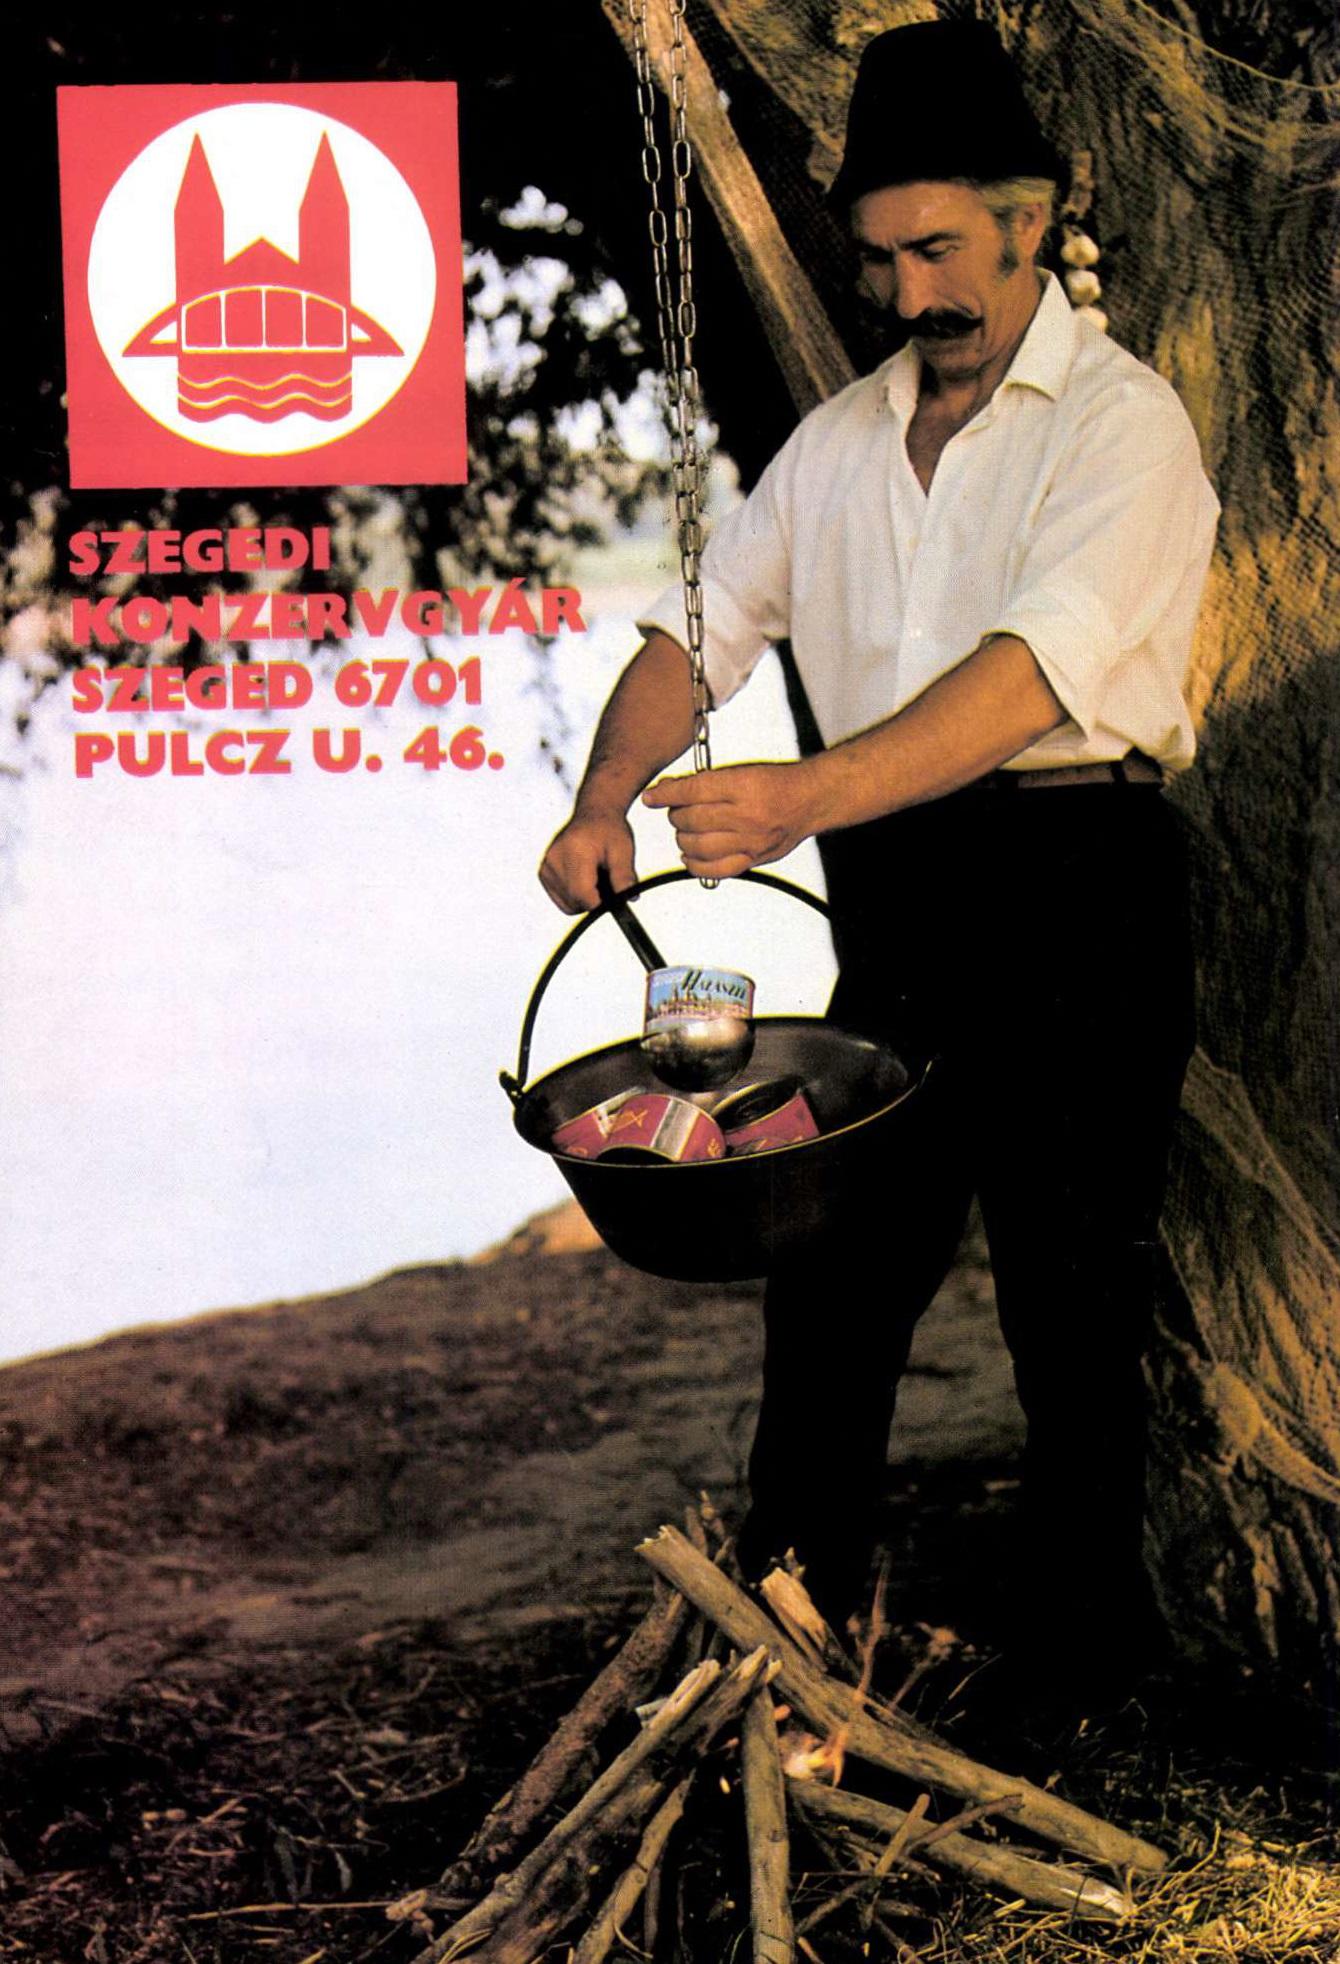 idokapszula_nb_i_1983_84_tavaszi_zaras_edzoi_gyorsmerleg_i_reklam_3.jpg